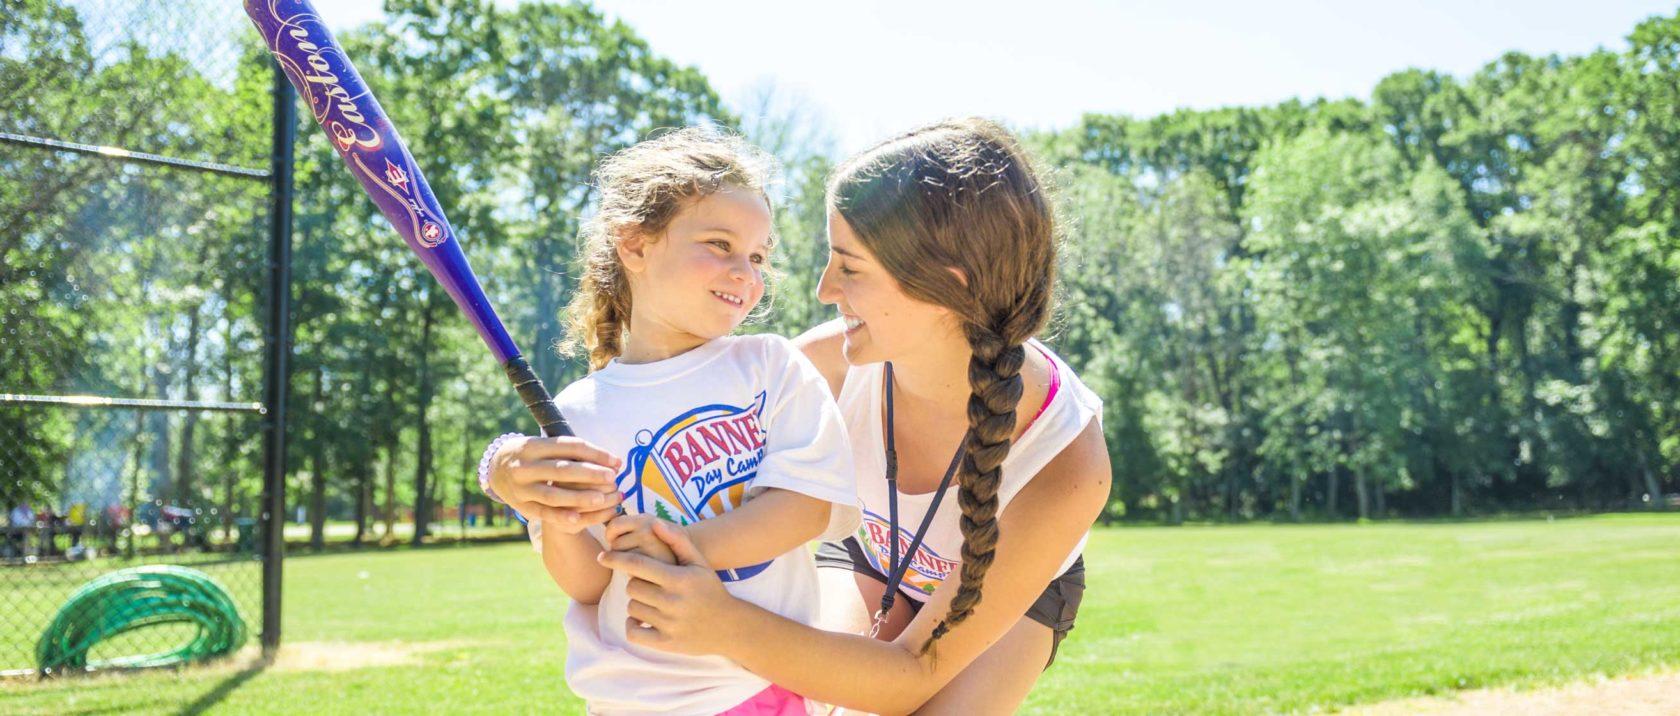 Staff member teaching a girl camper how to swing a softball bat